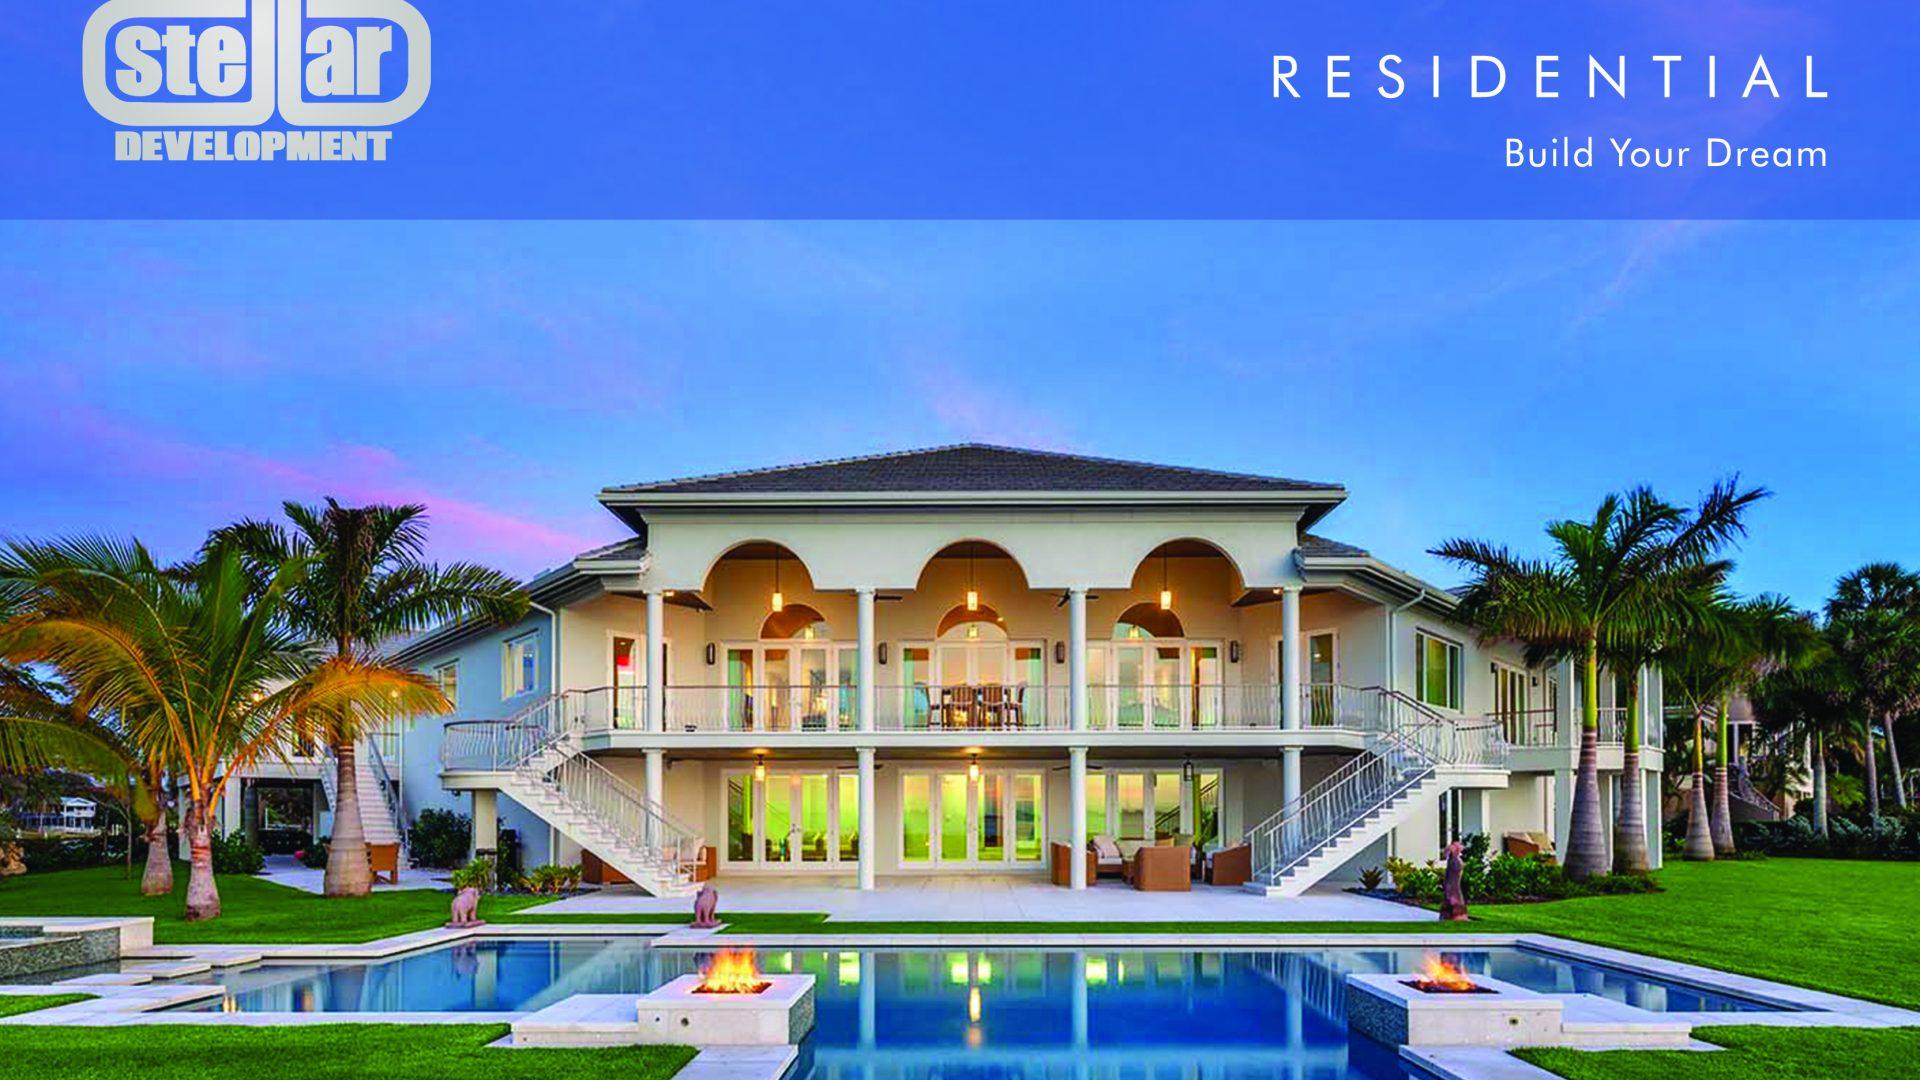 Stellar Development Residential General Contractor